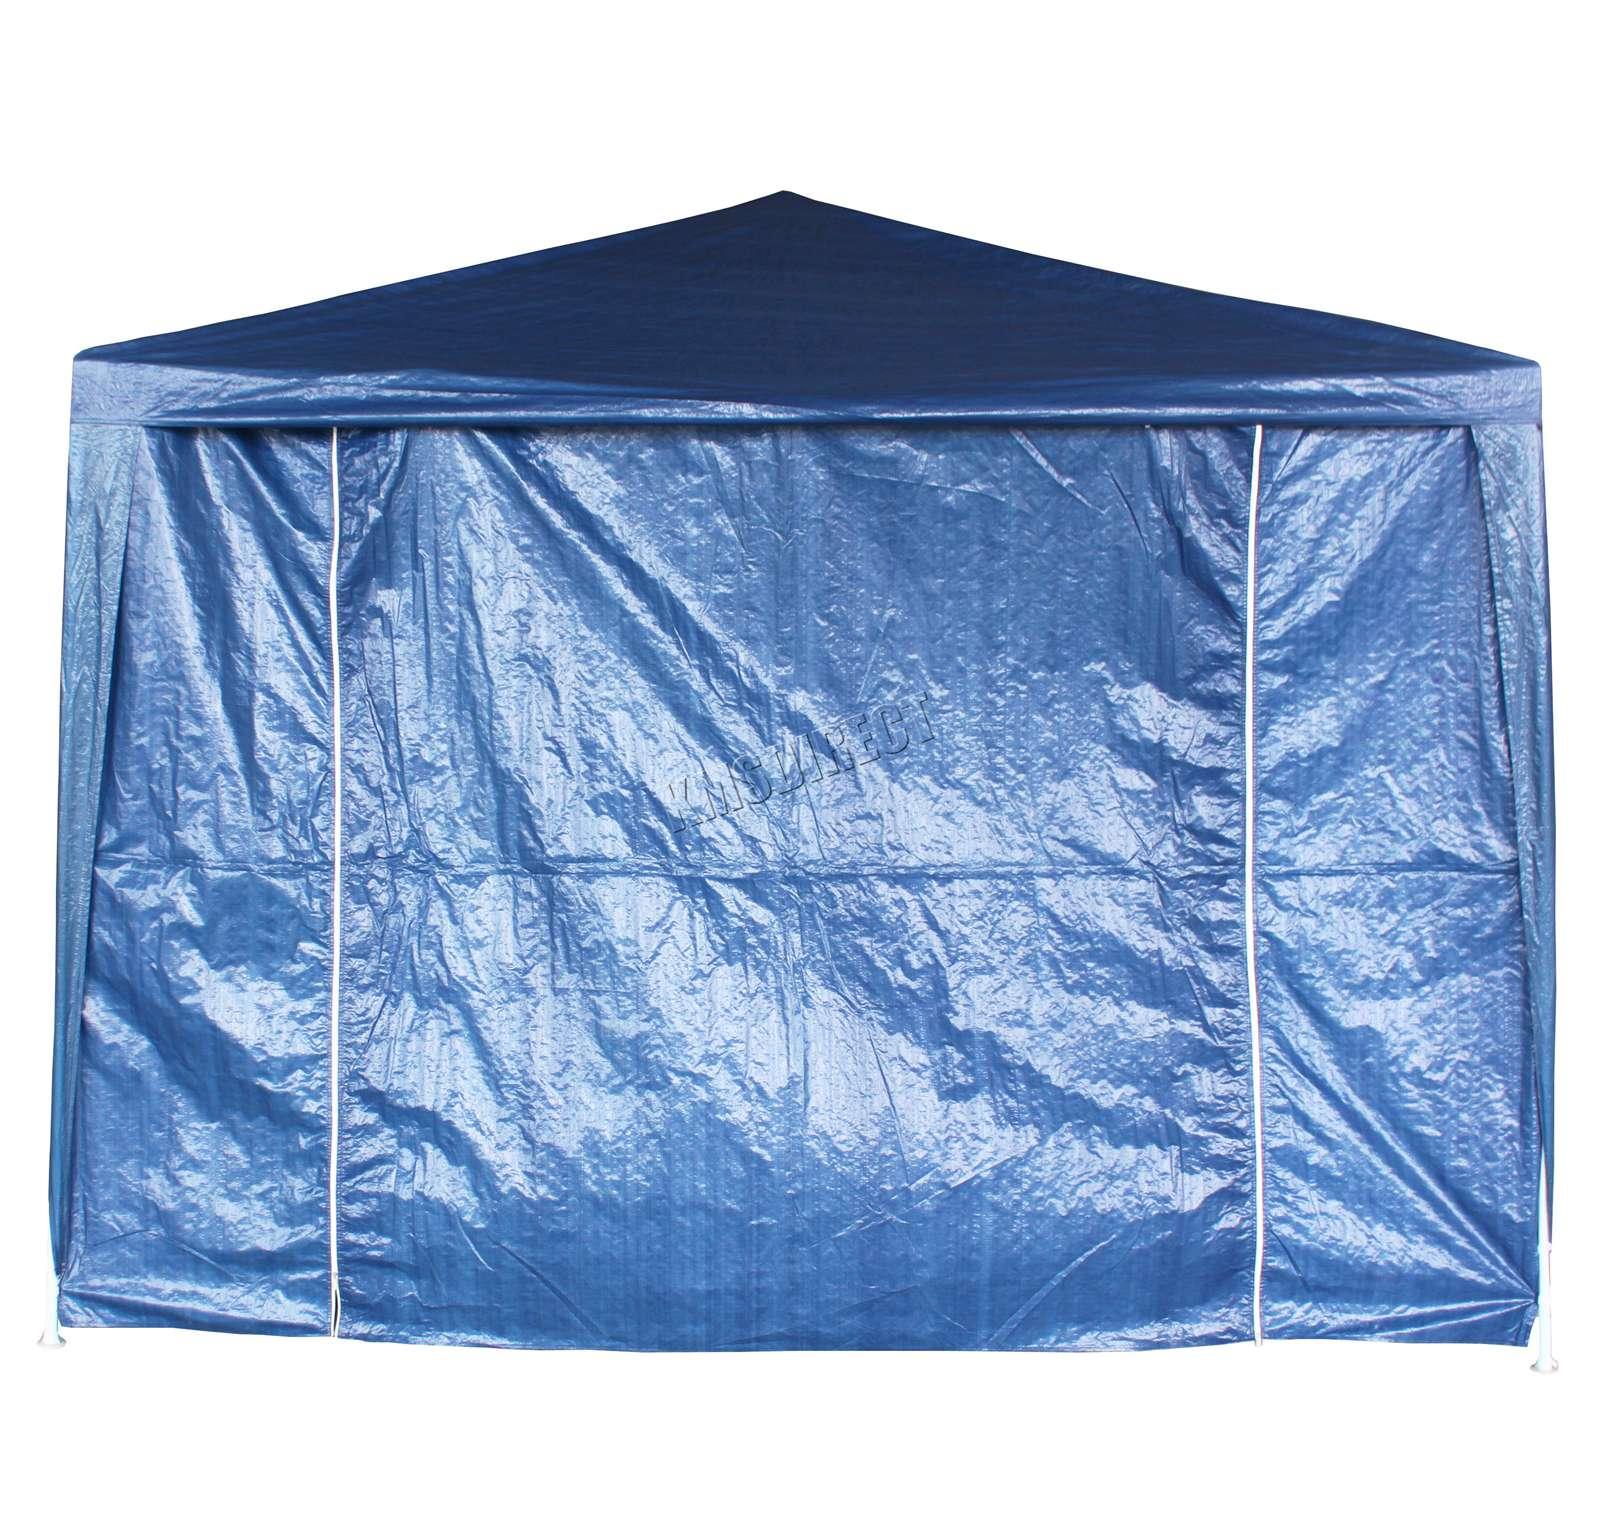 New-3-x-3m-120g-Waterproof-Outdoor-PE-Garden-Gazebo-Marquee-Canopy-Party-Tent Indexbild 18